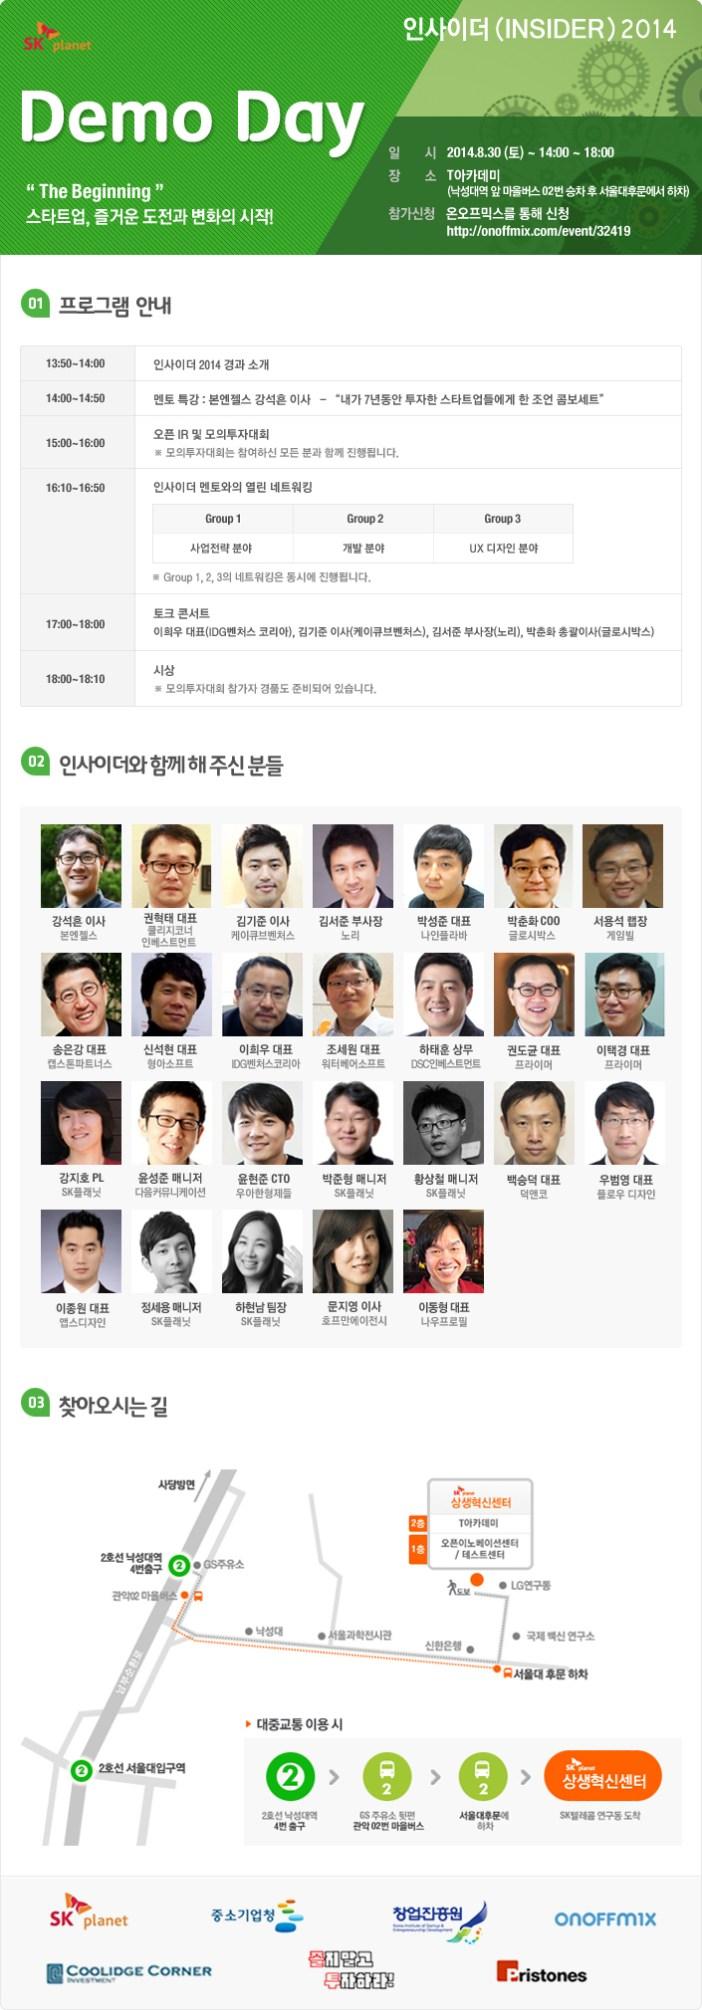 SK플래닛 인사이더_데모데이_포스터 2014